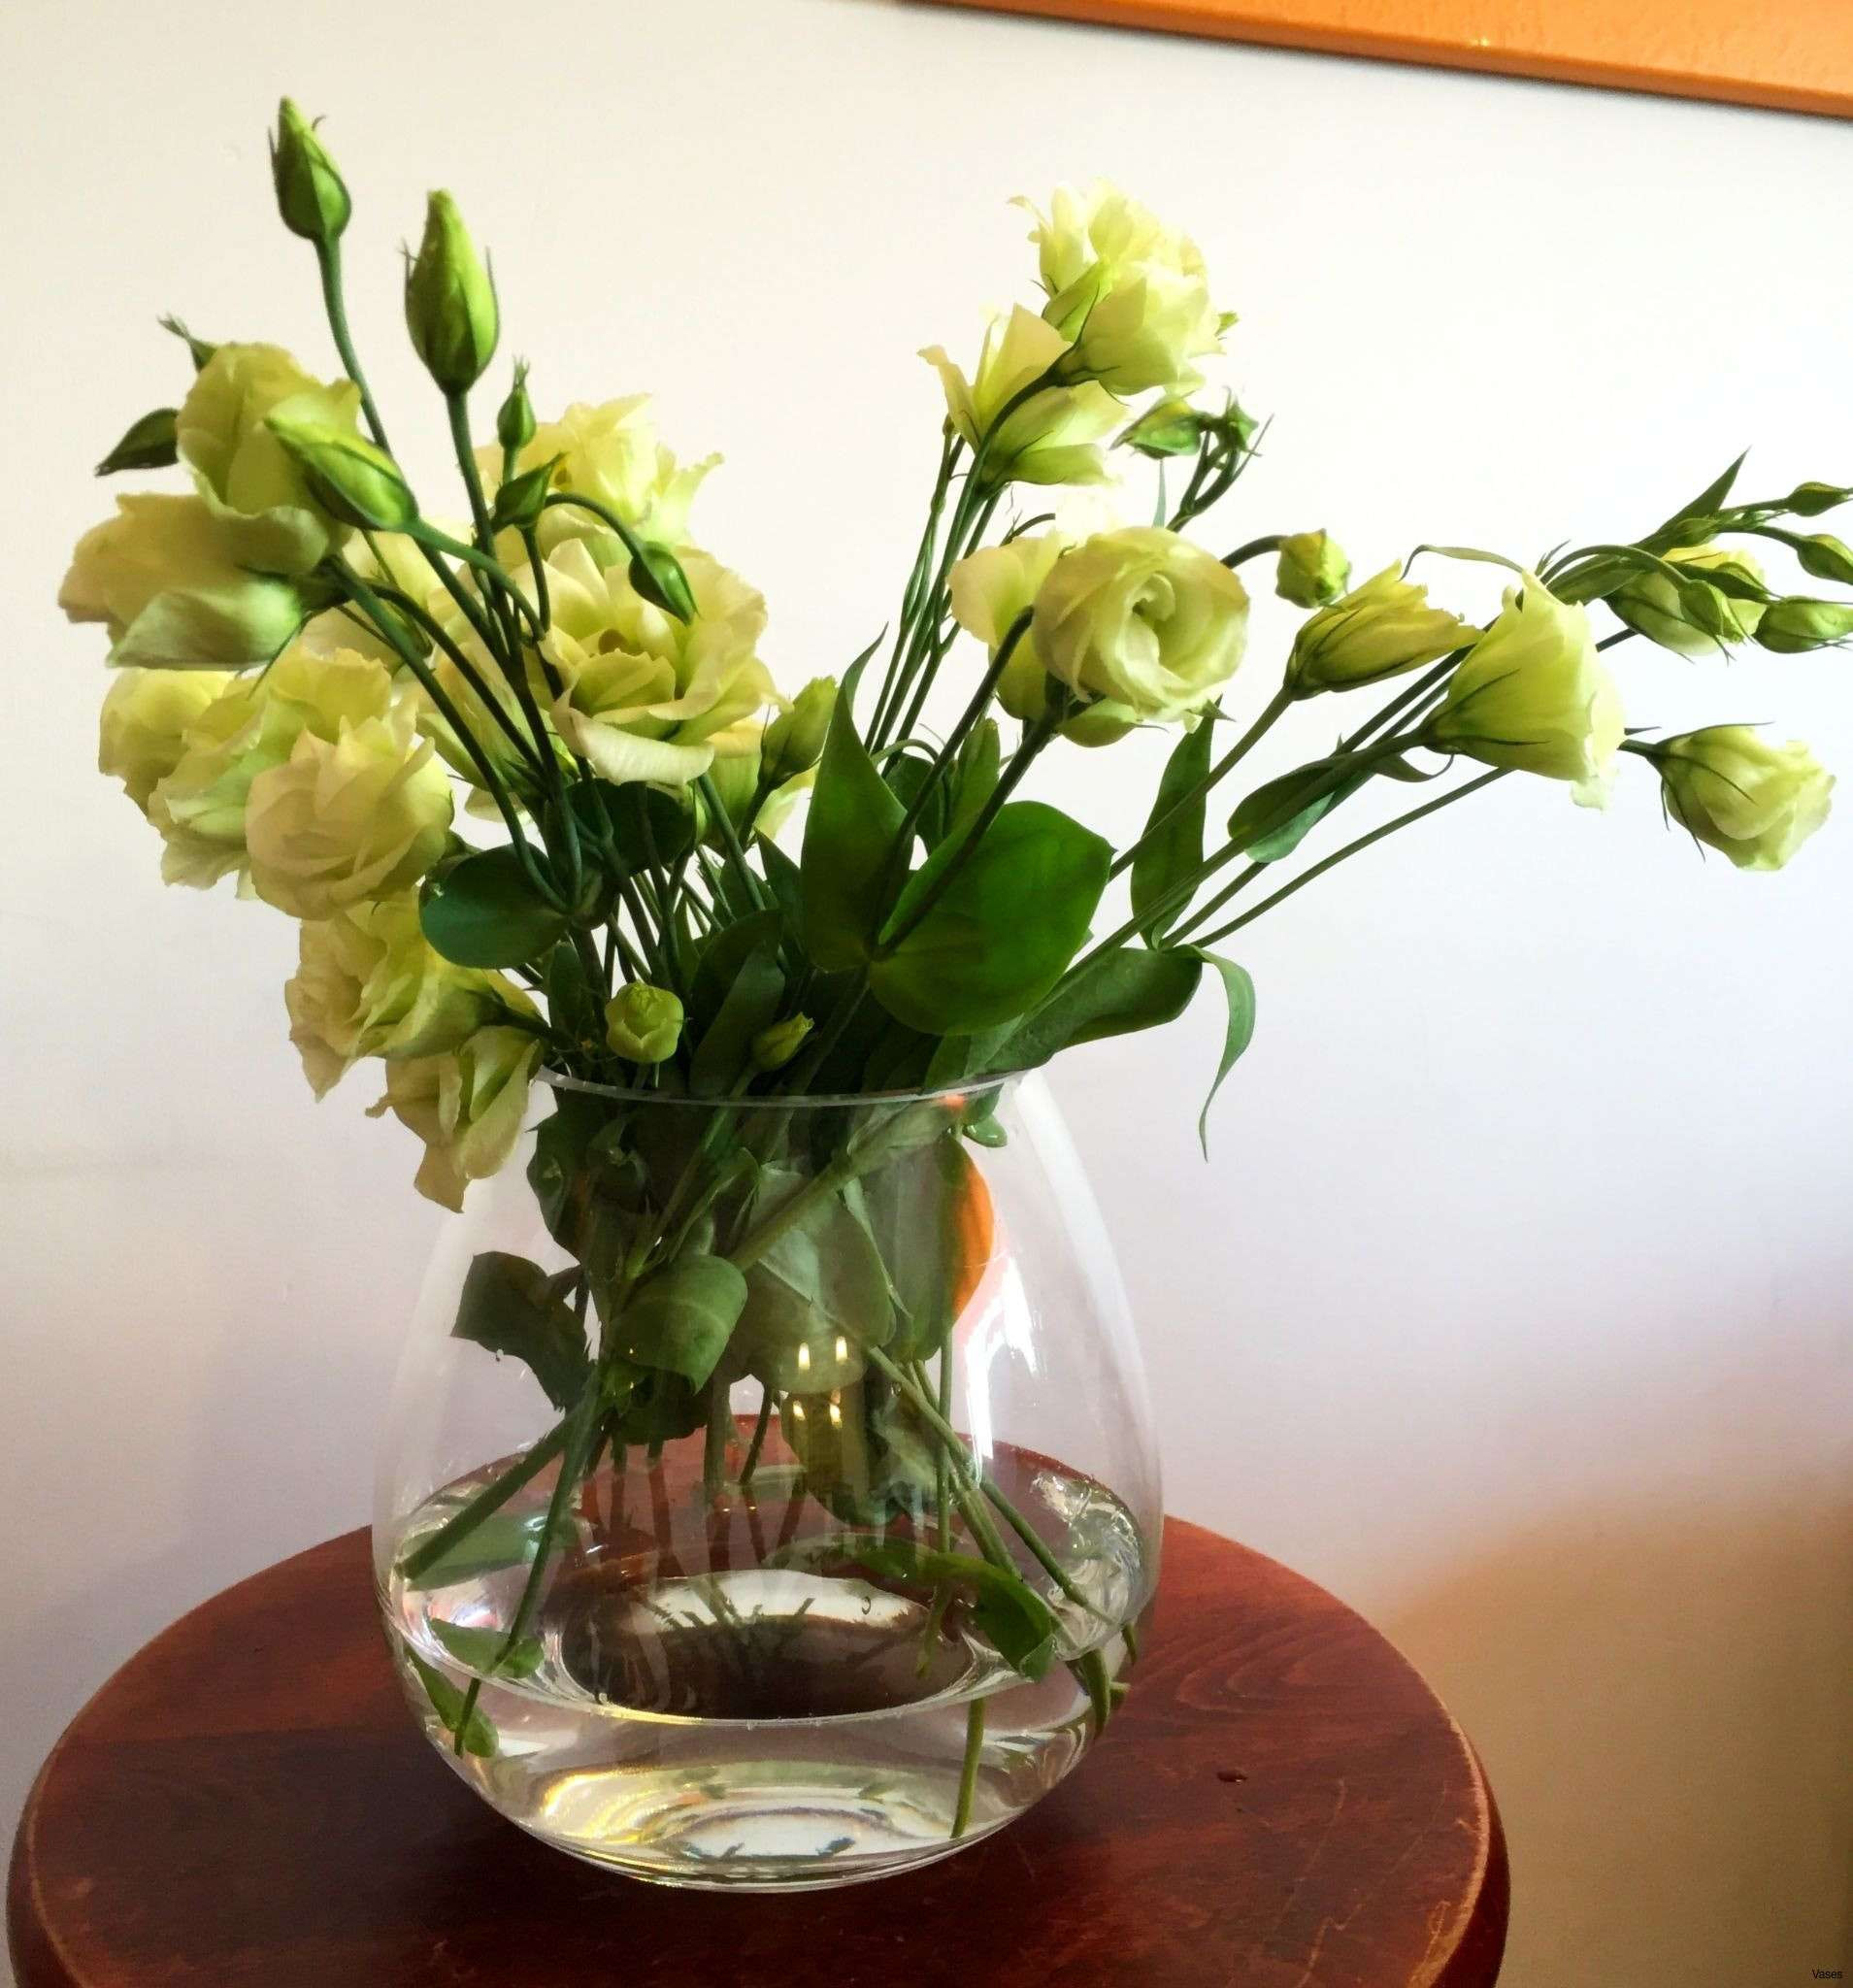 lavender flower vase of 48 lovely flower bouquet ideas gallery amazing home decor ideas with flower vase table 04h vases tablei 0d clipart dining base end design flower base